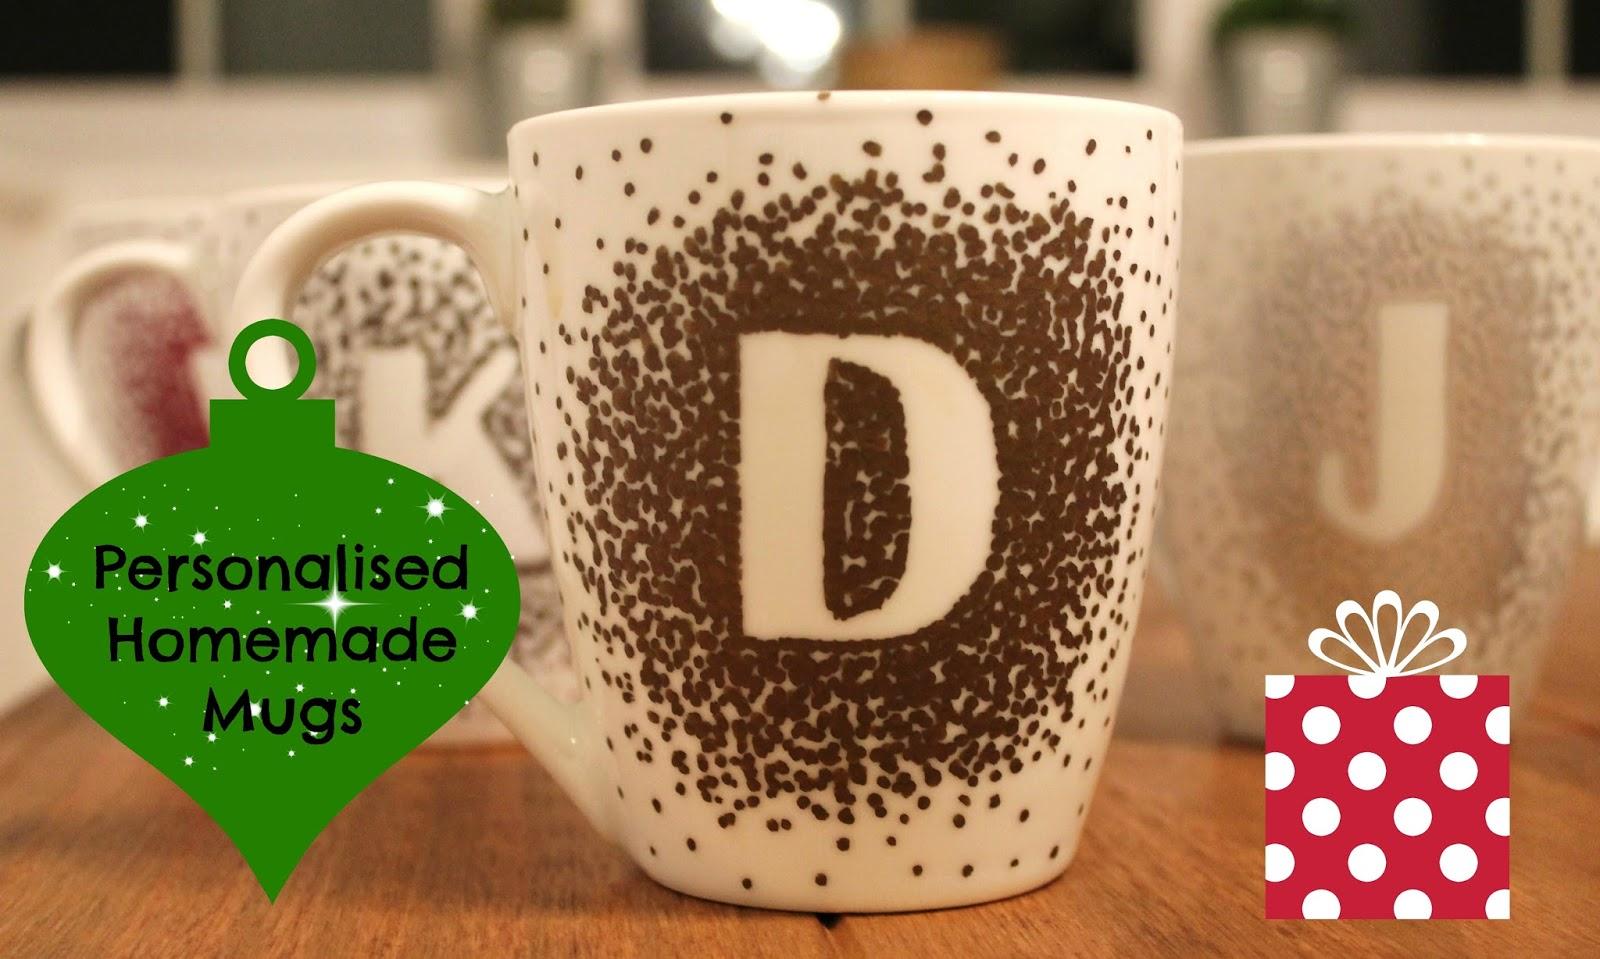 Personalised Homemade Mug Christmas craft idea